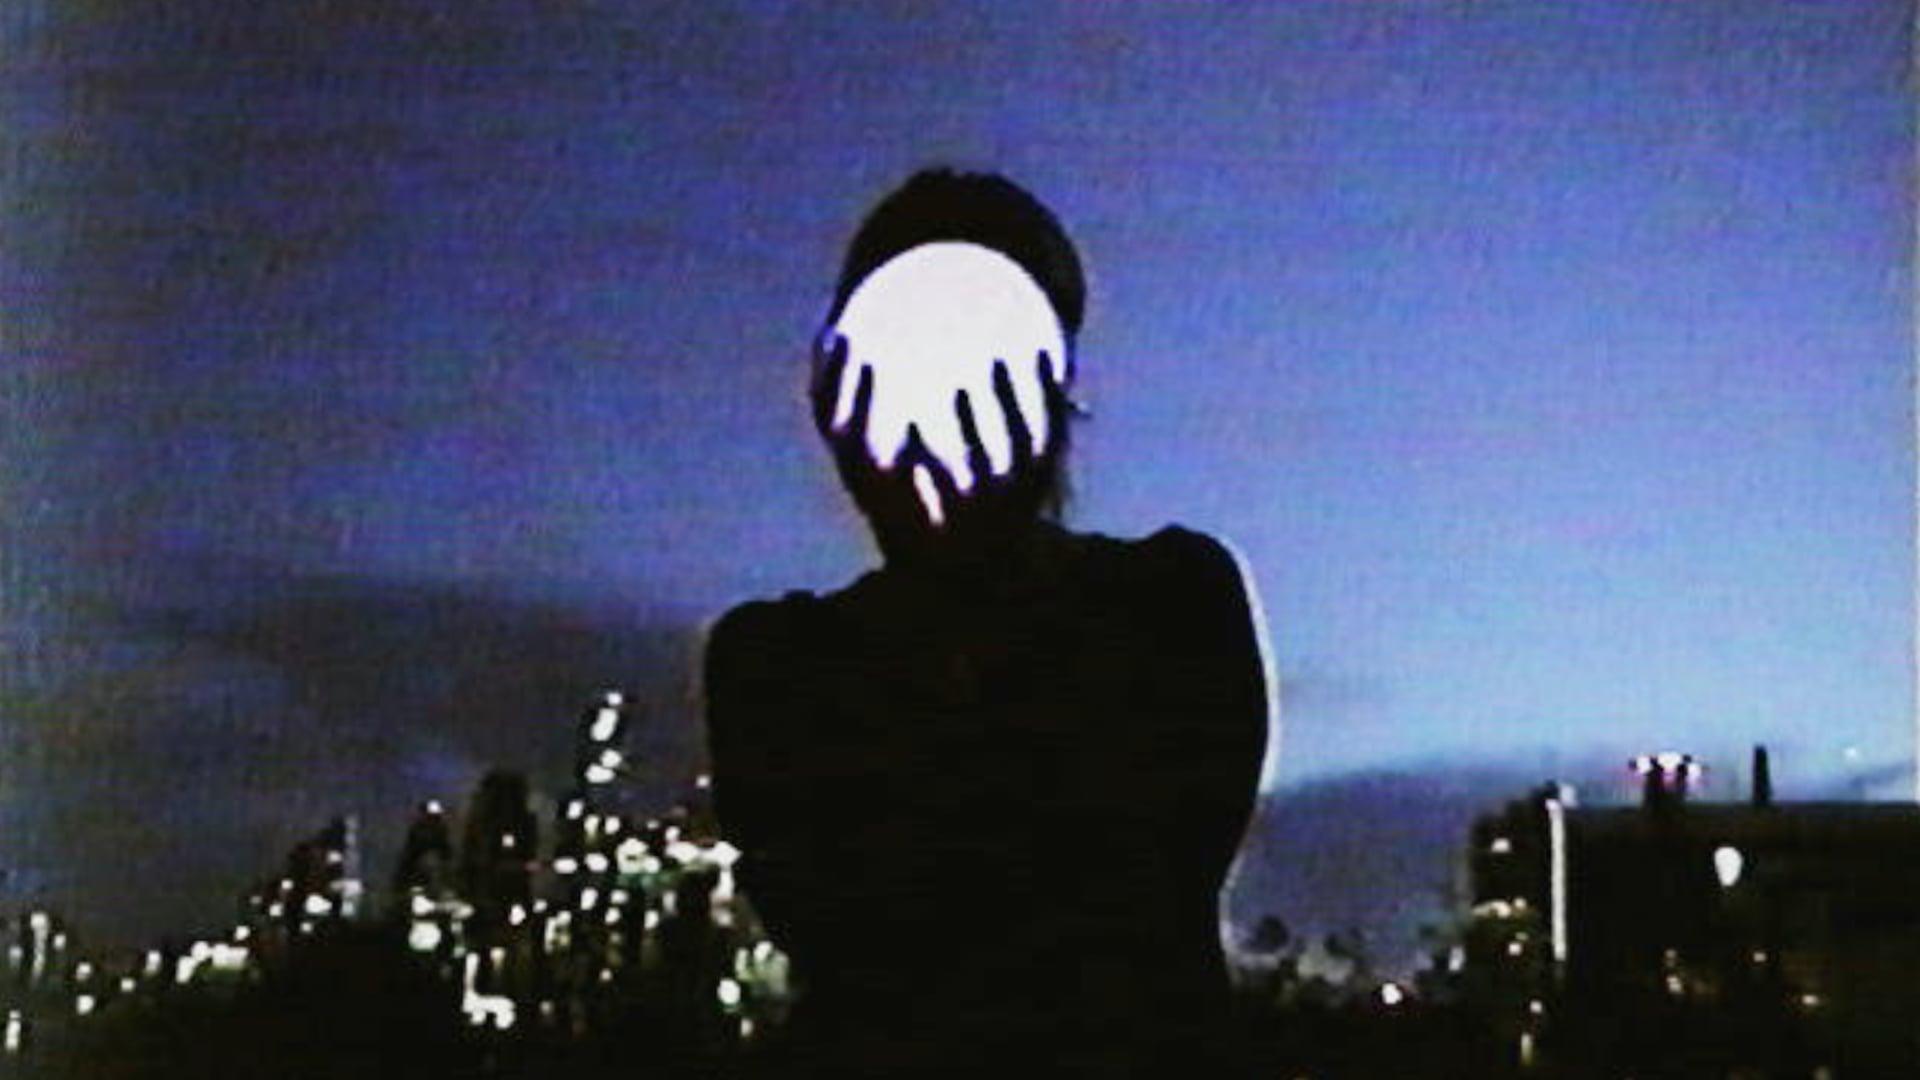 Bearcraft - Where the sun sets [Official Music Video]